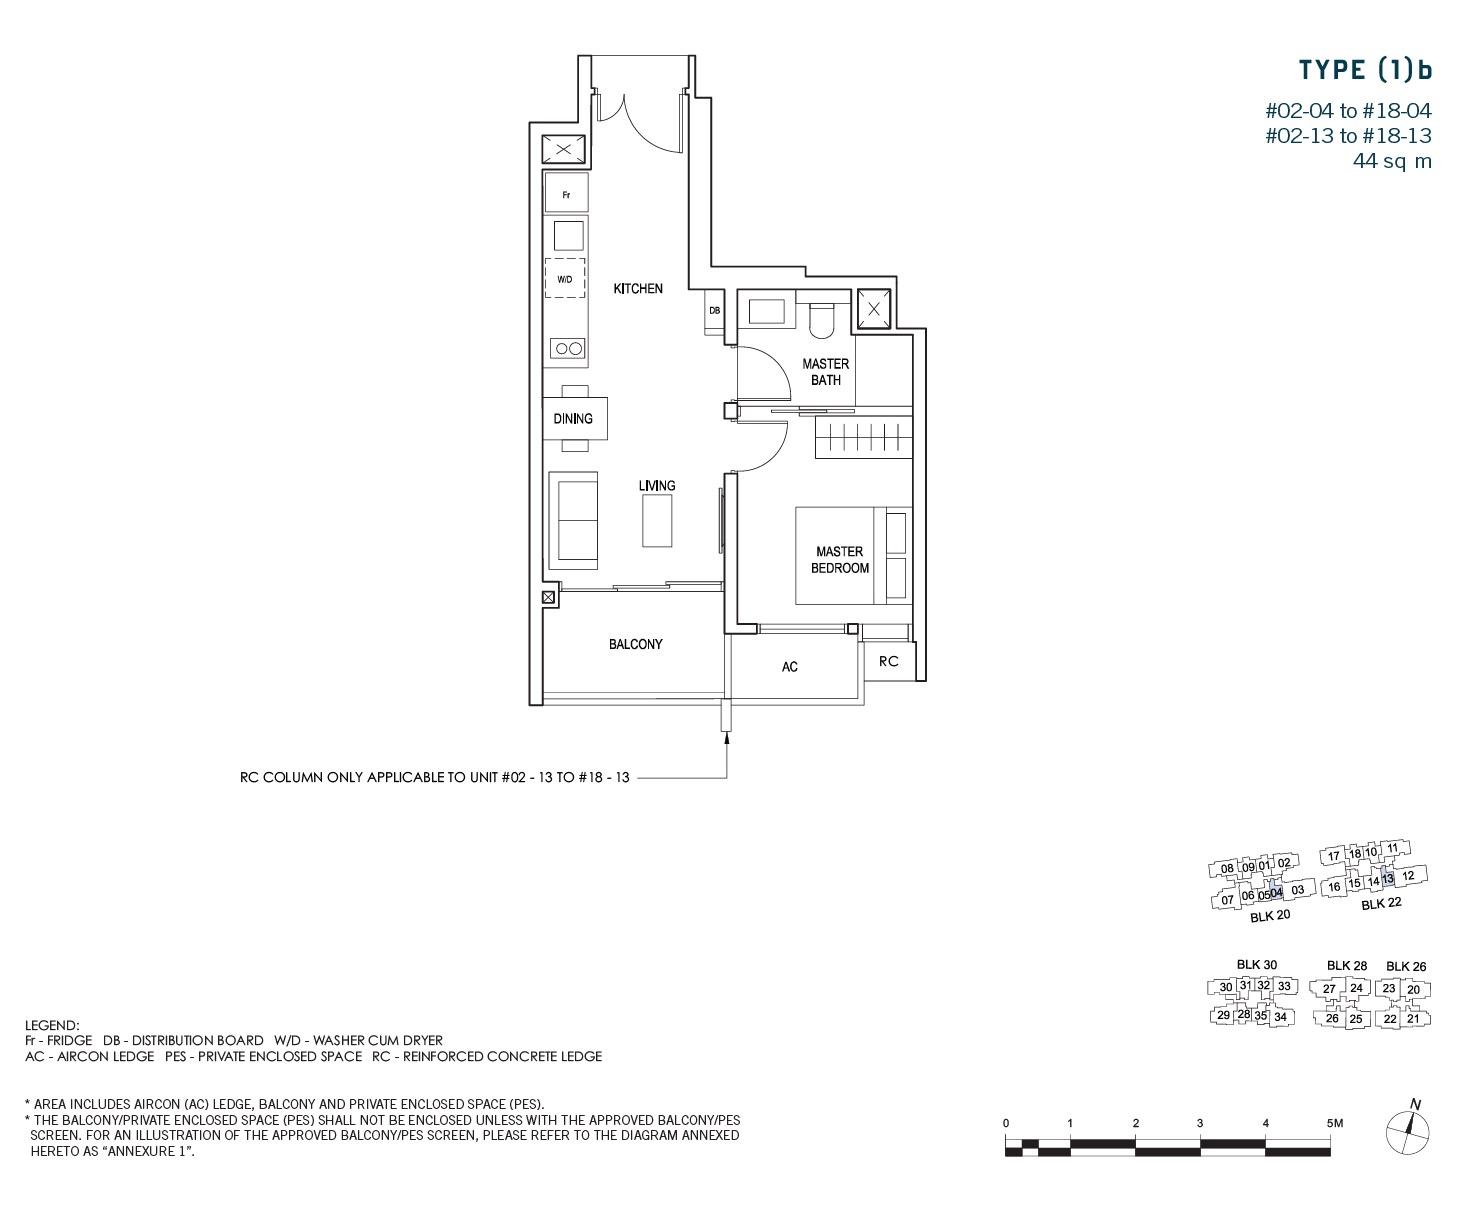 penrose-sims-floorplan 1BR 1B